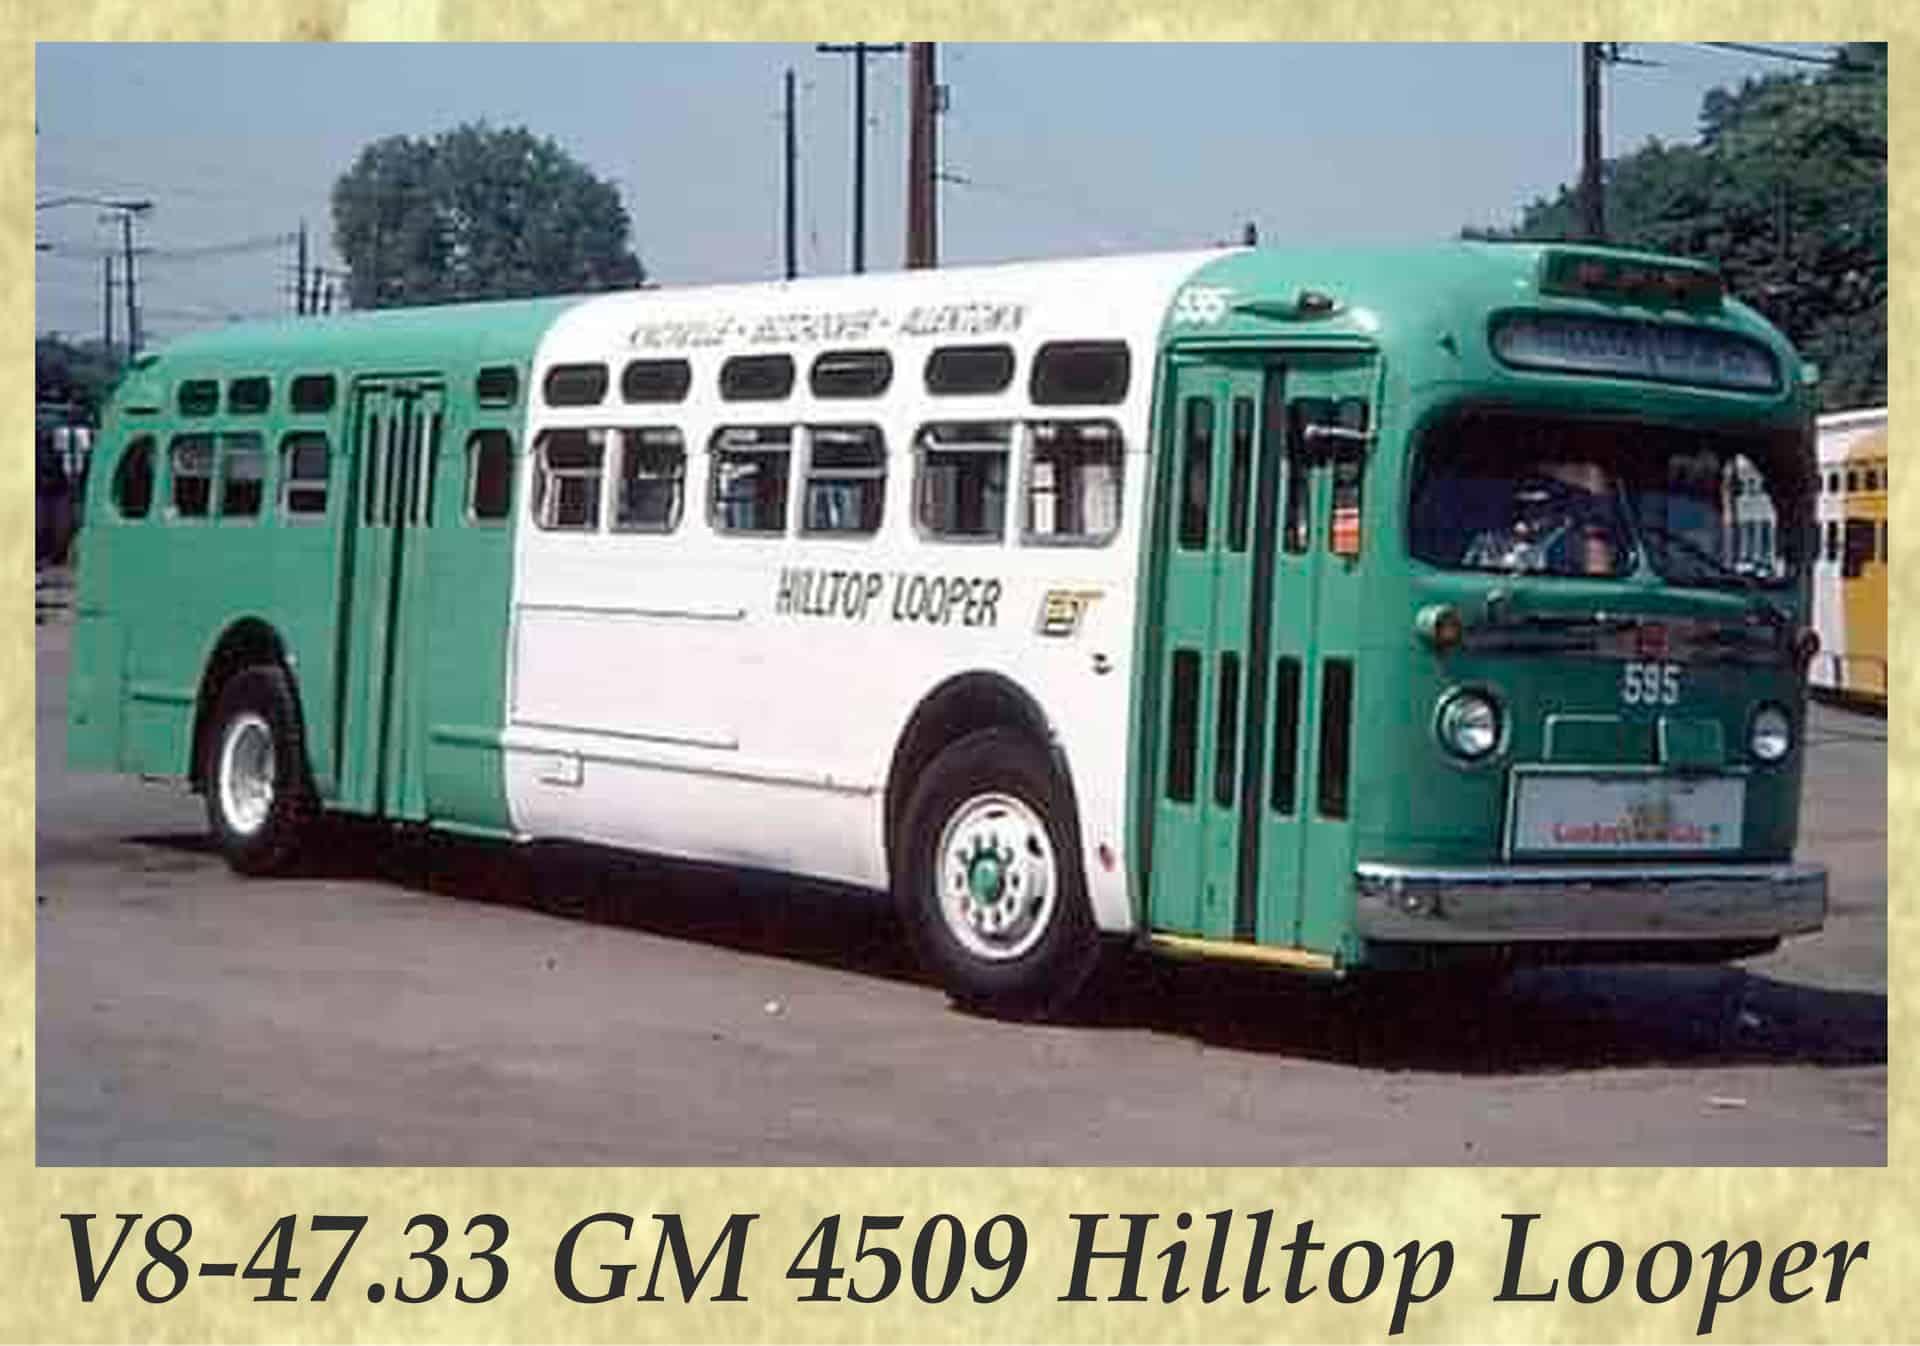 V8-47.33 GM 4509 Hilltop Looper